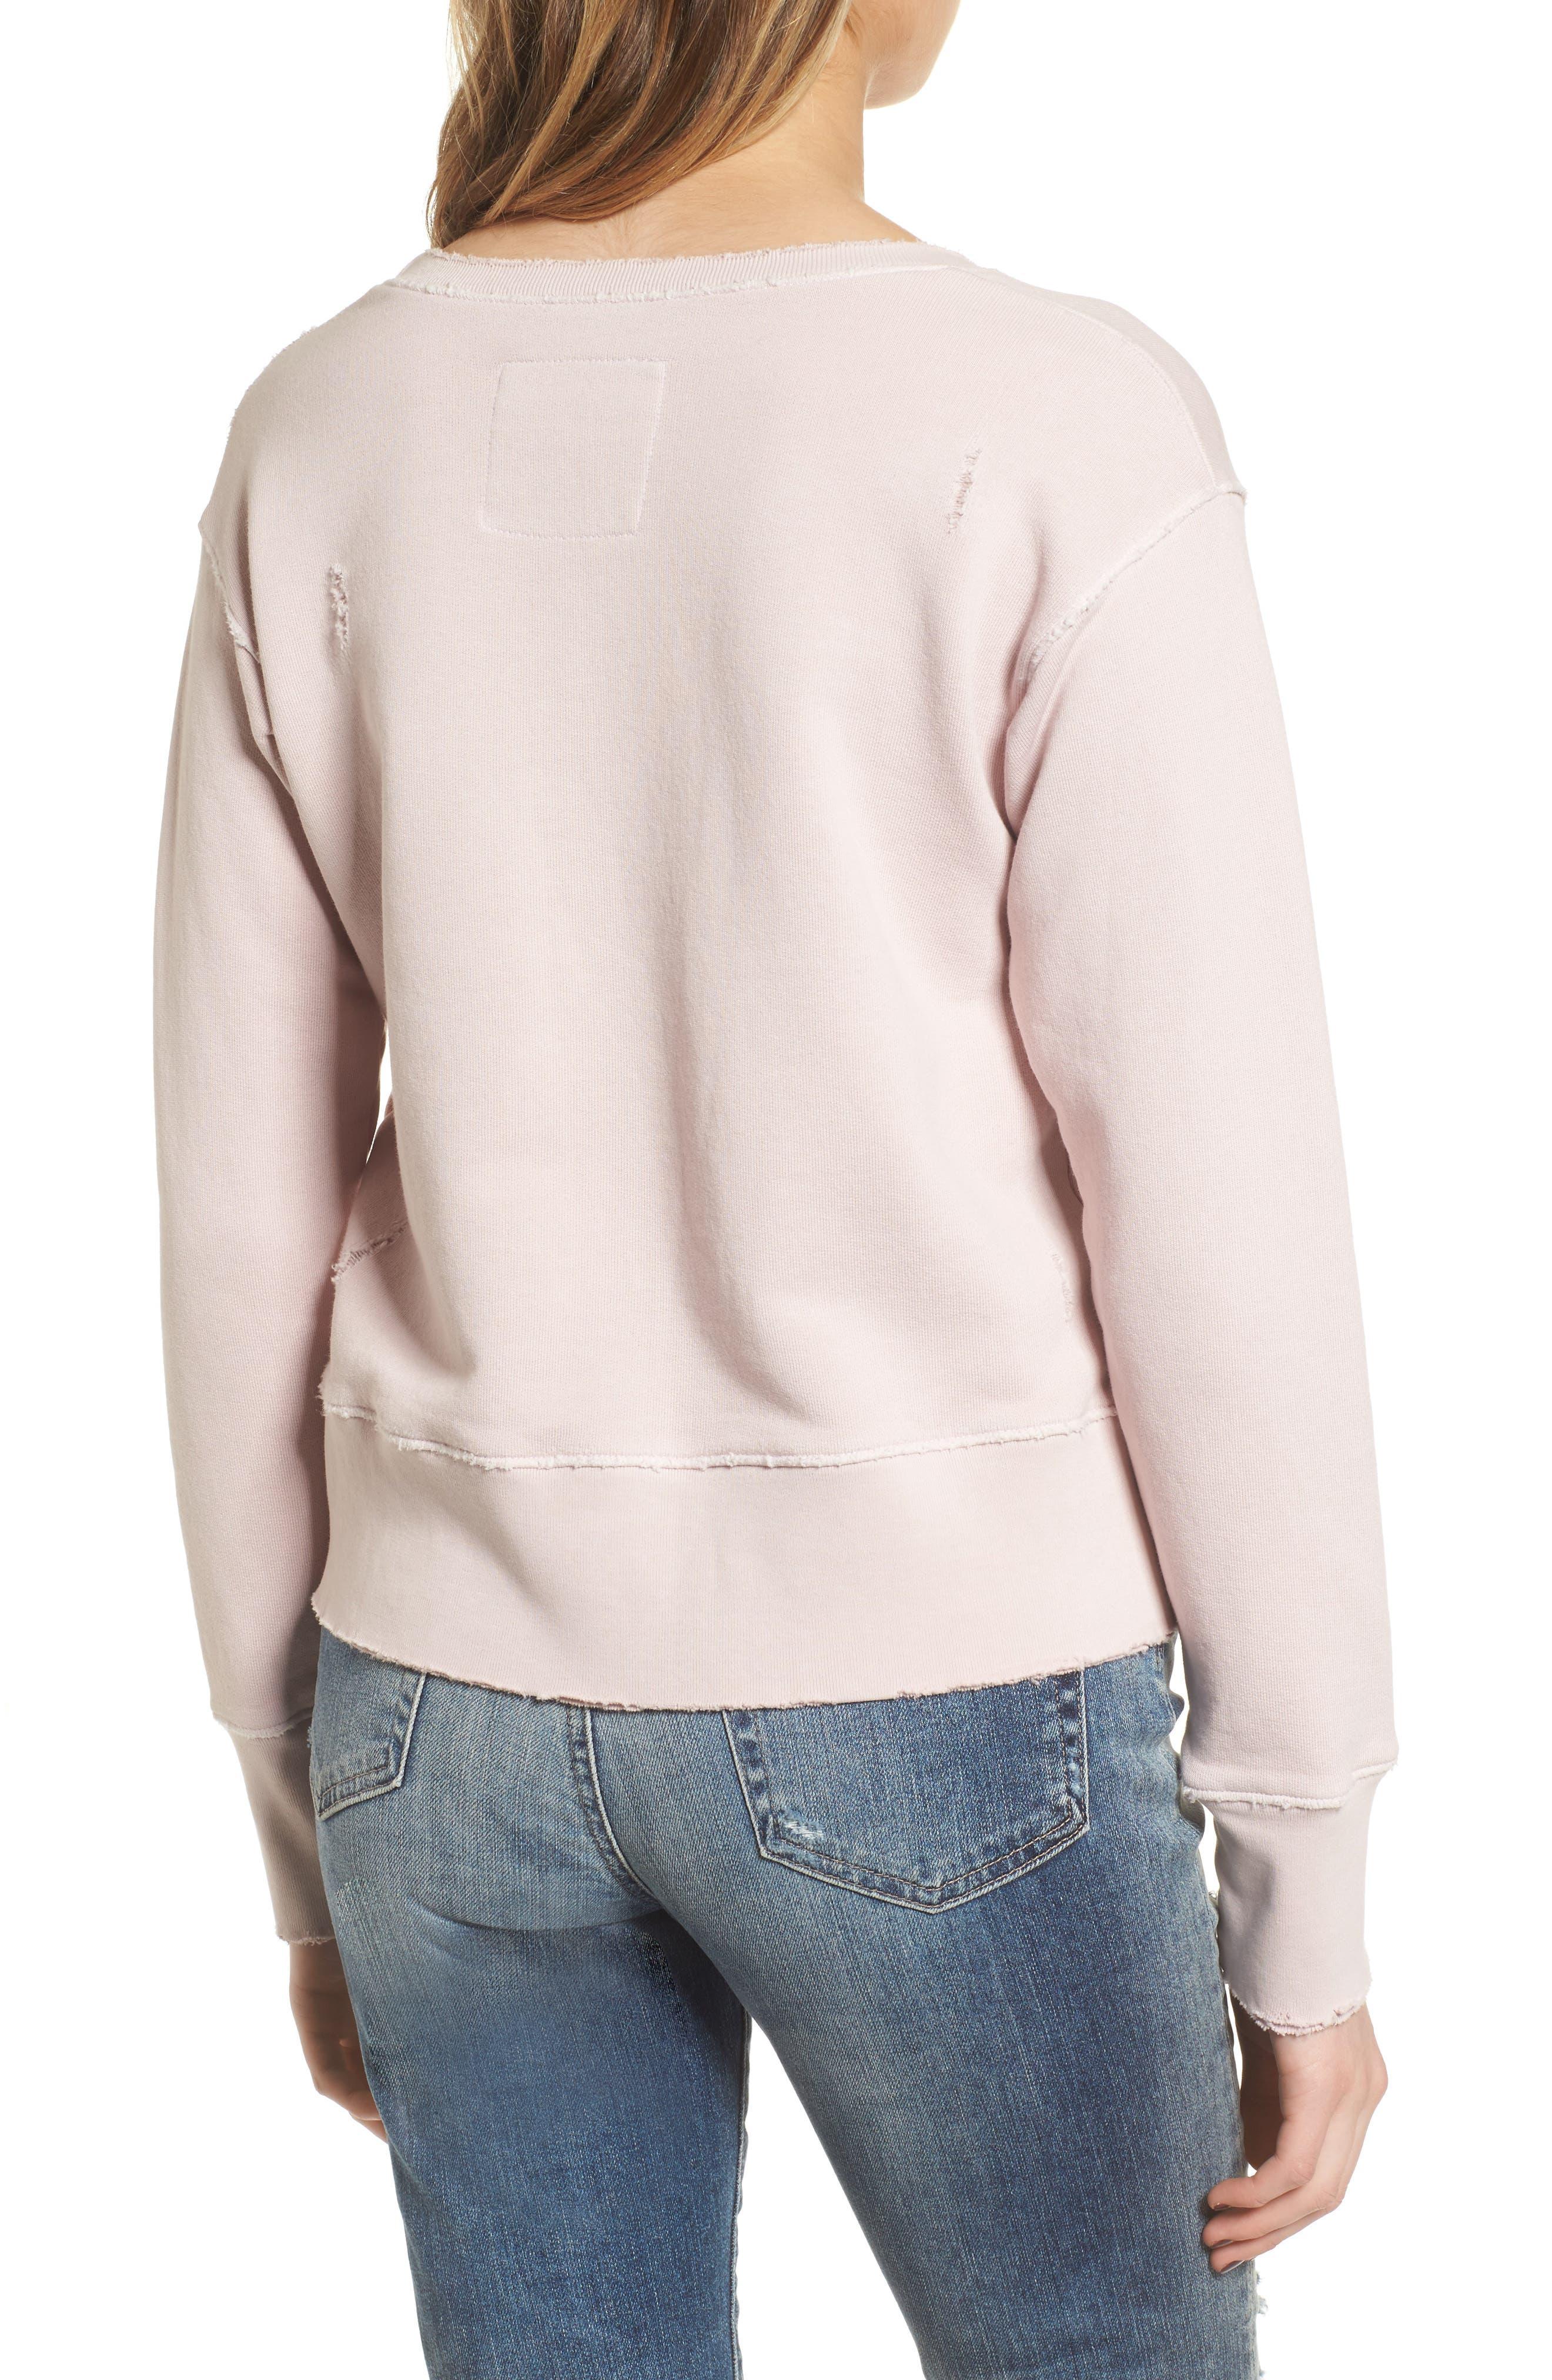 Tee Lab Cotton Sweatshirt,                             Alternate thumbnail 2, color,